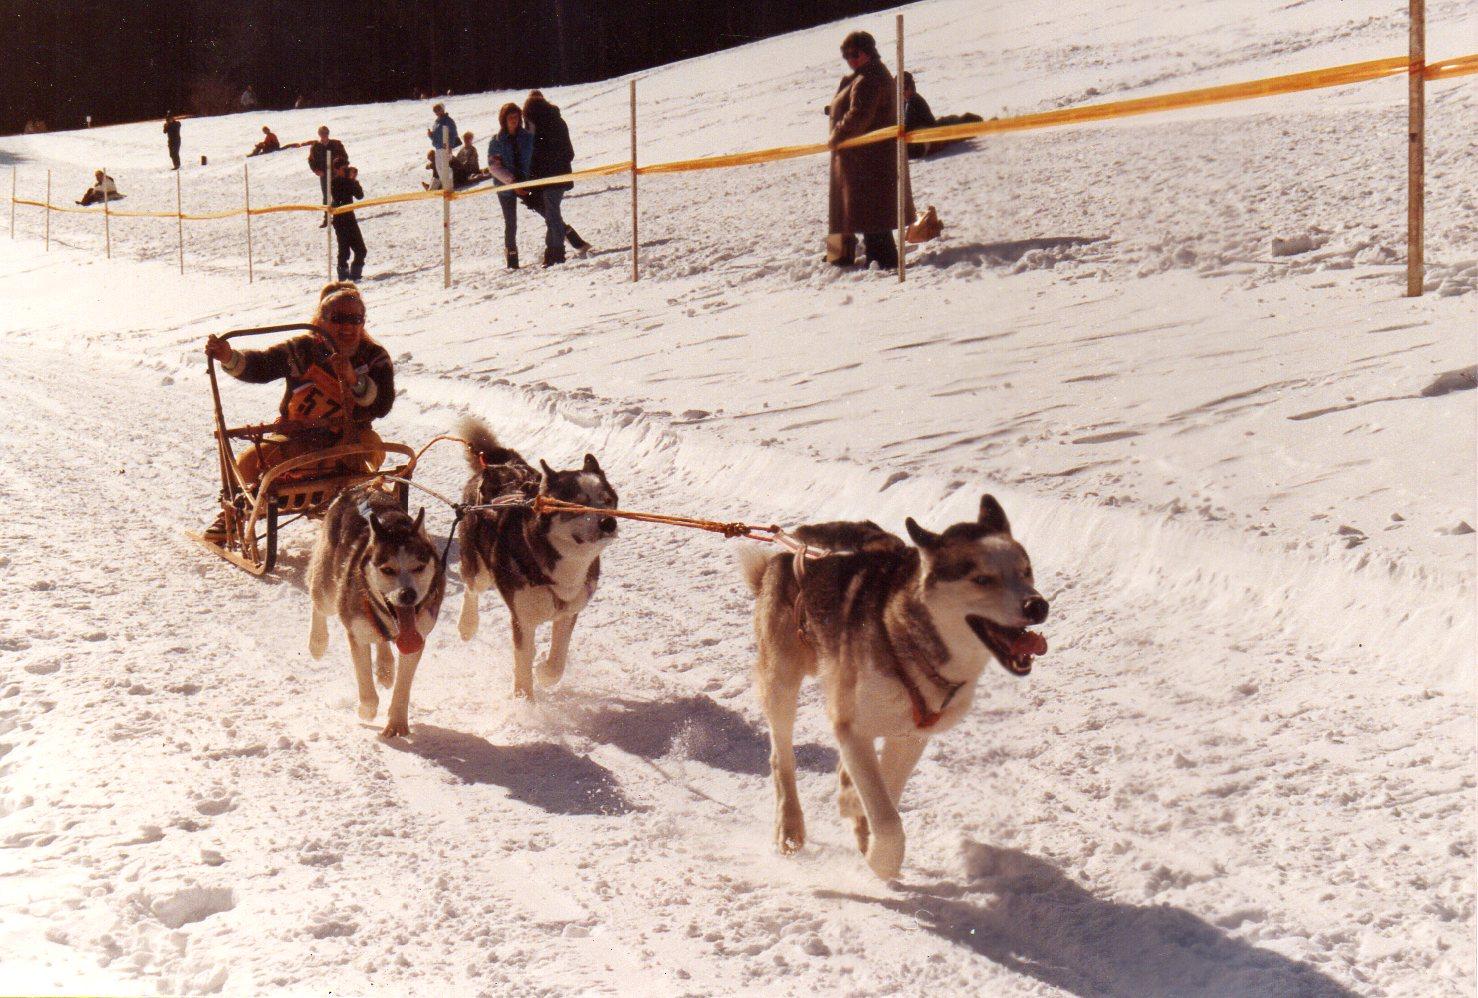 toodtmoos 1985 CE